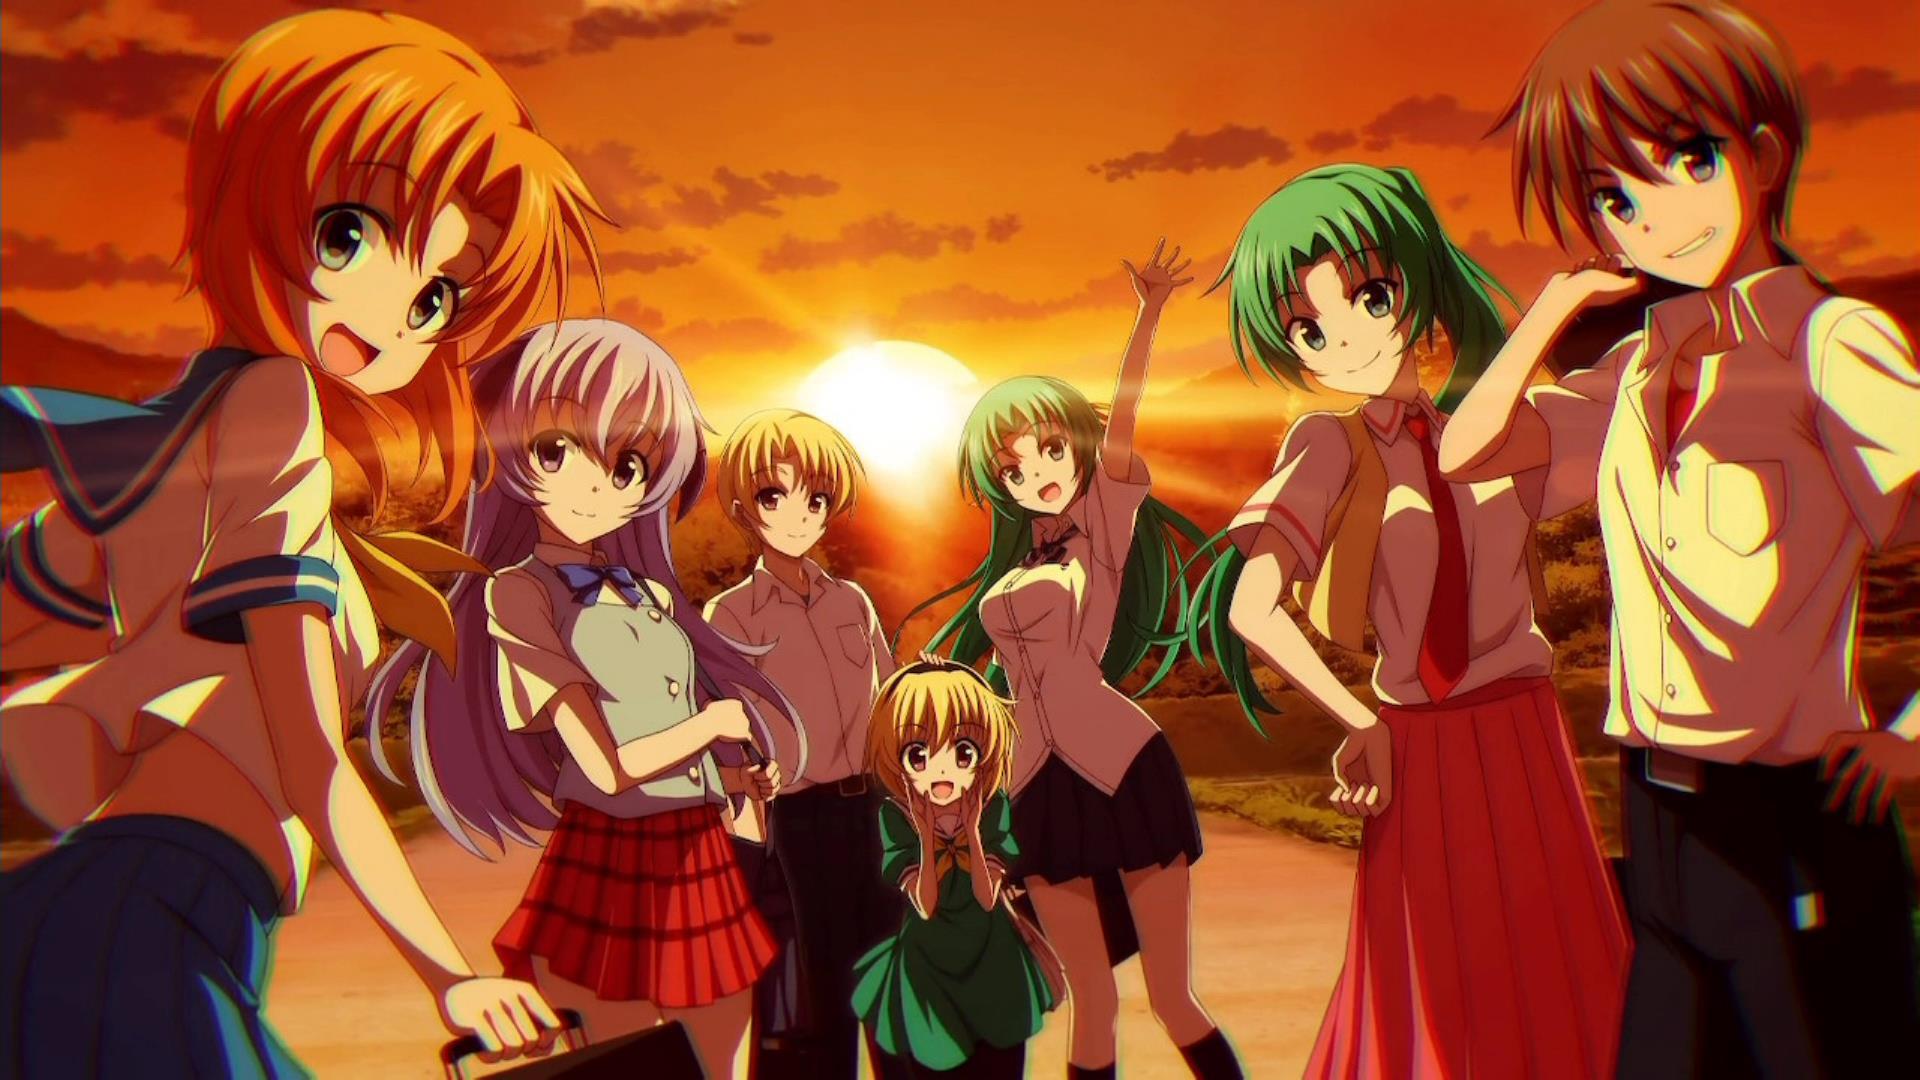 Когда плачут цикады: Разгадки — Спецвыпуски / Higurashi no Naku Koro ni Kai Specials [1-24 (END)]